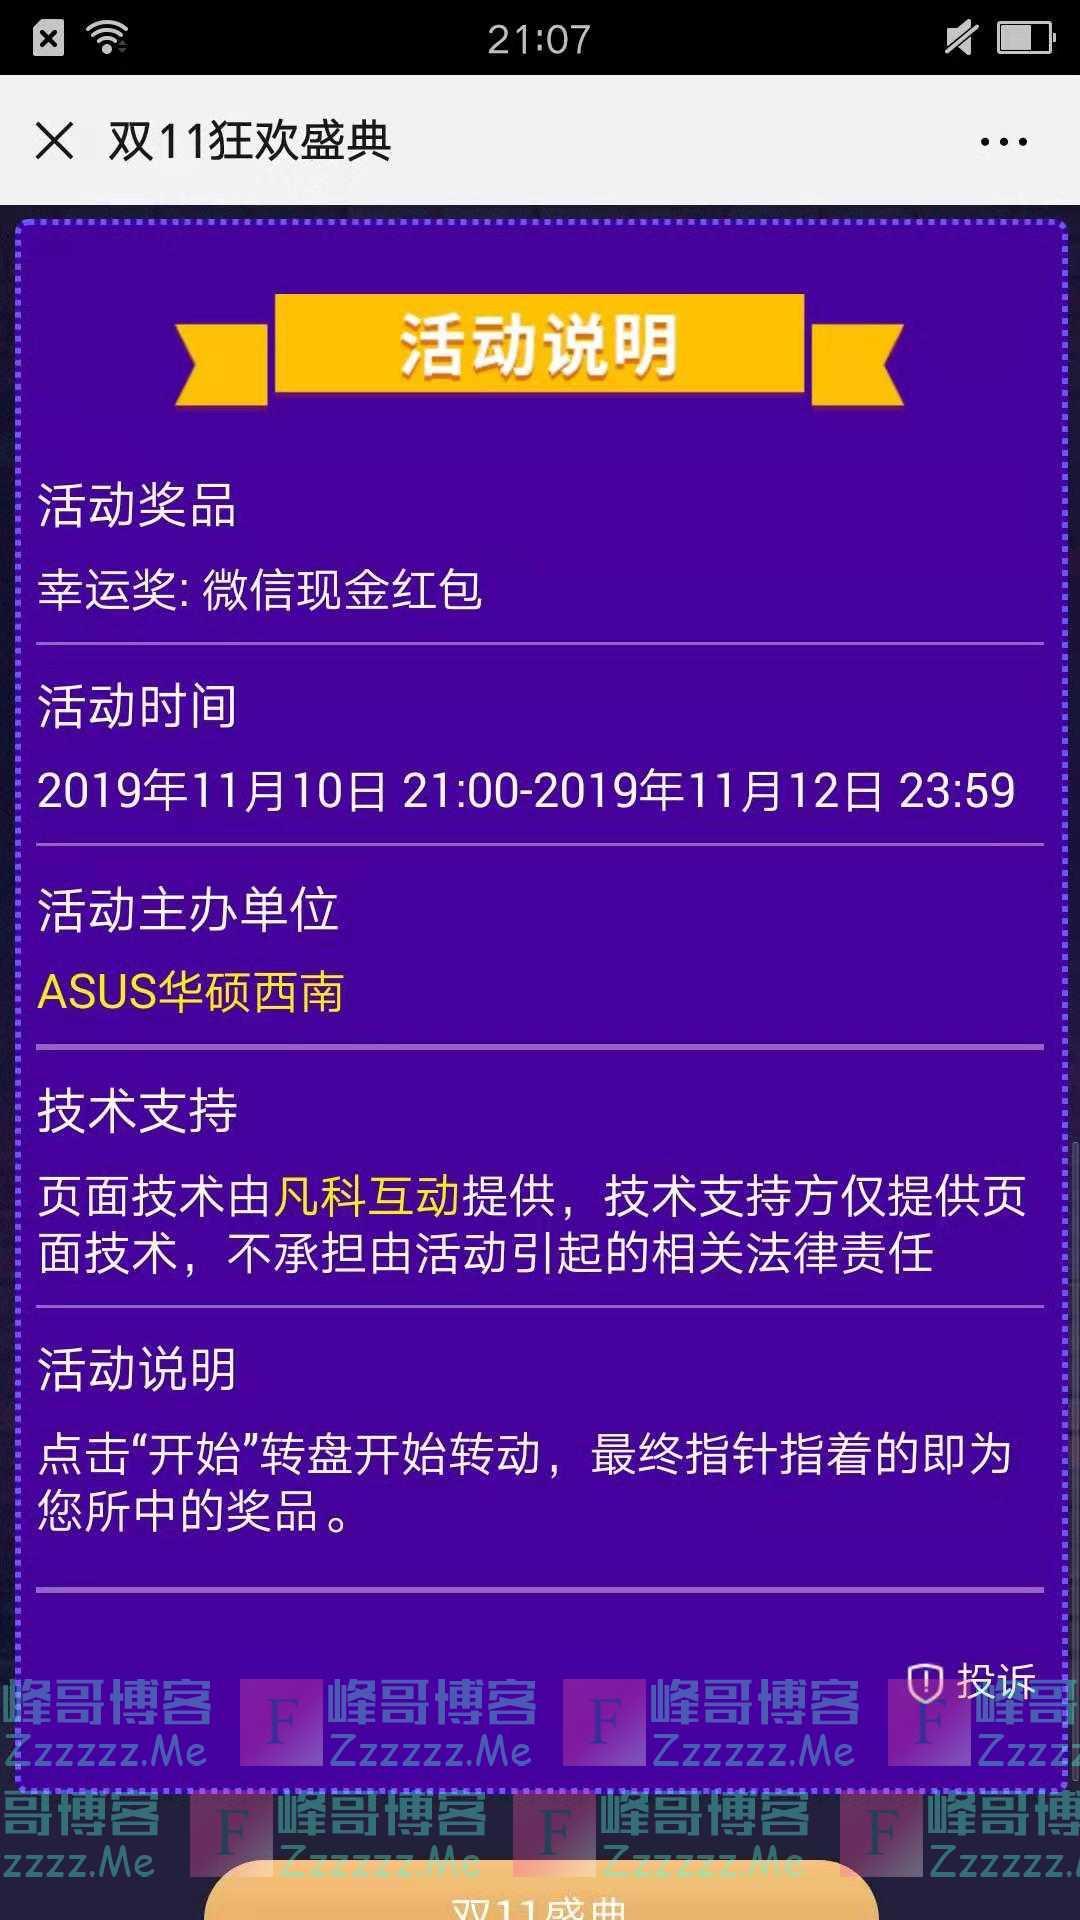 ASUS华硕西南赢取微信红包(截止11月12日)